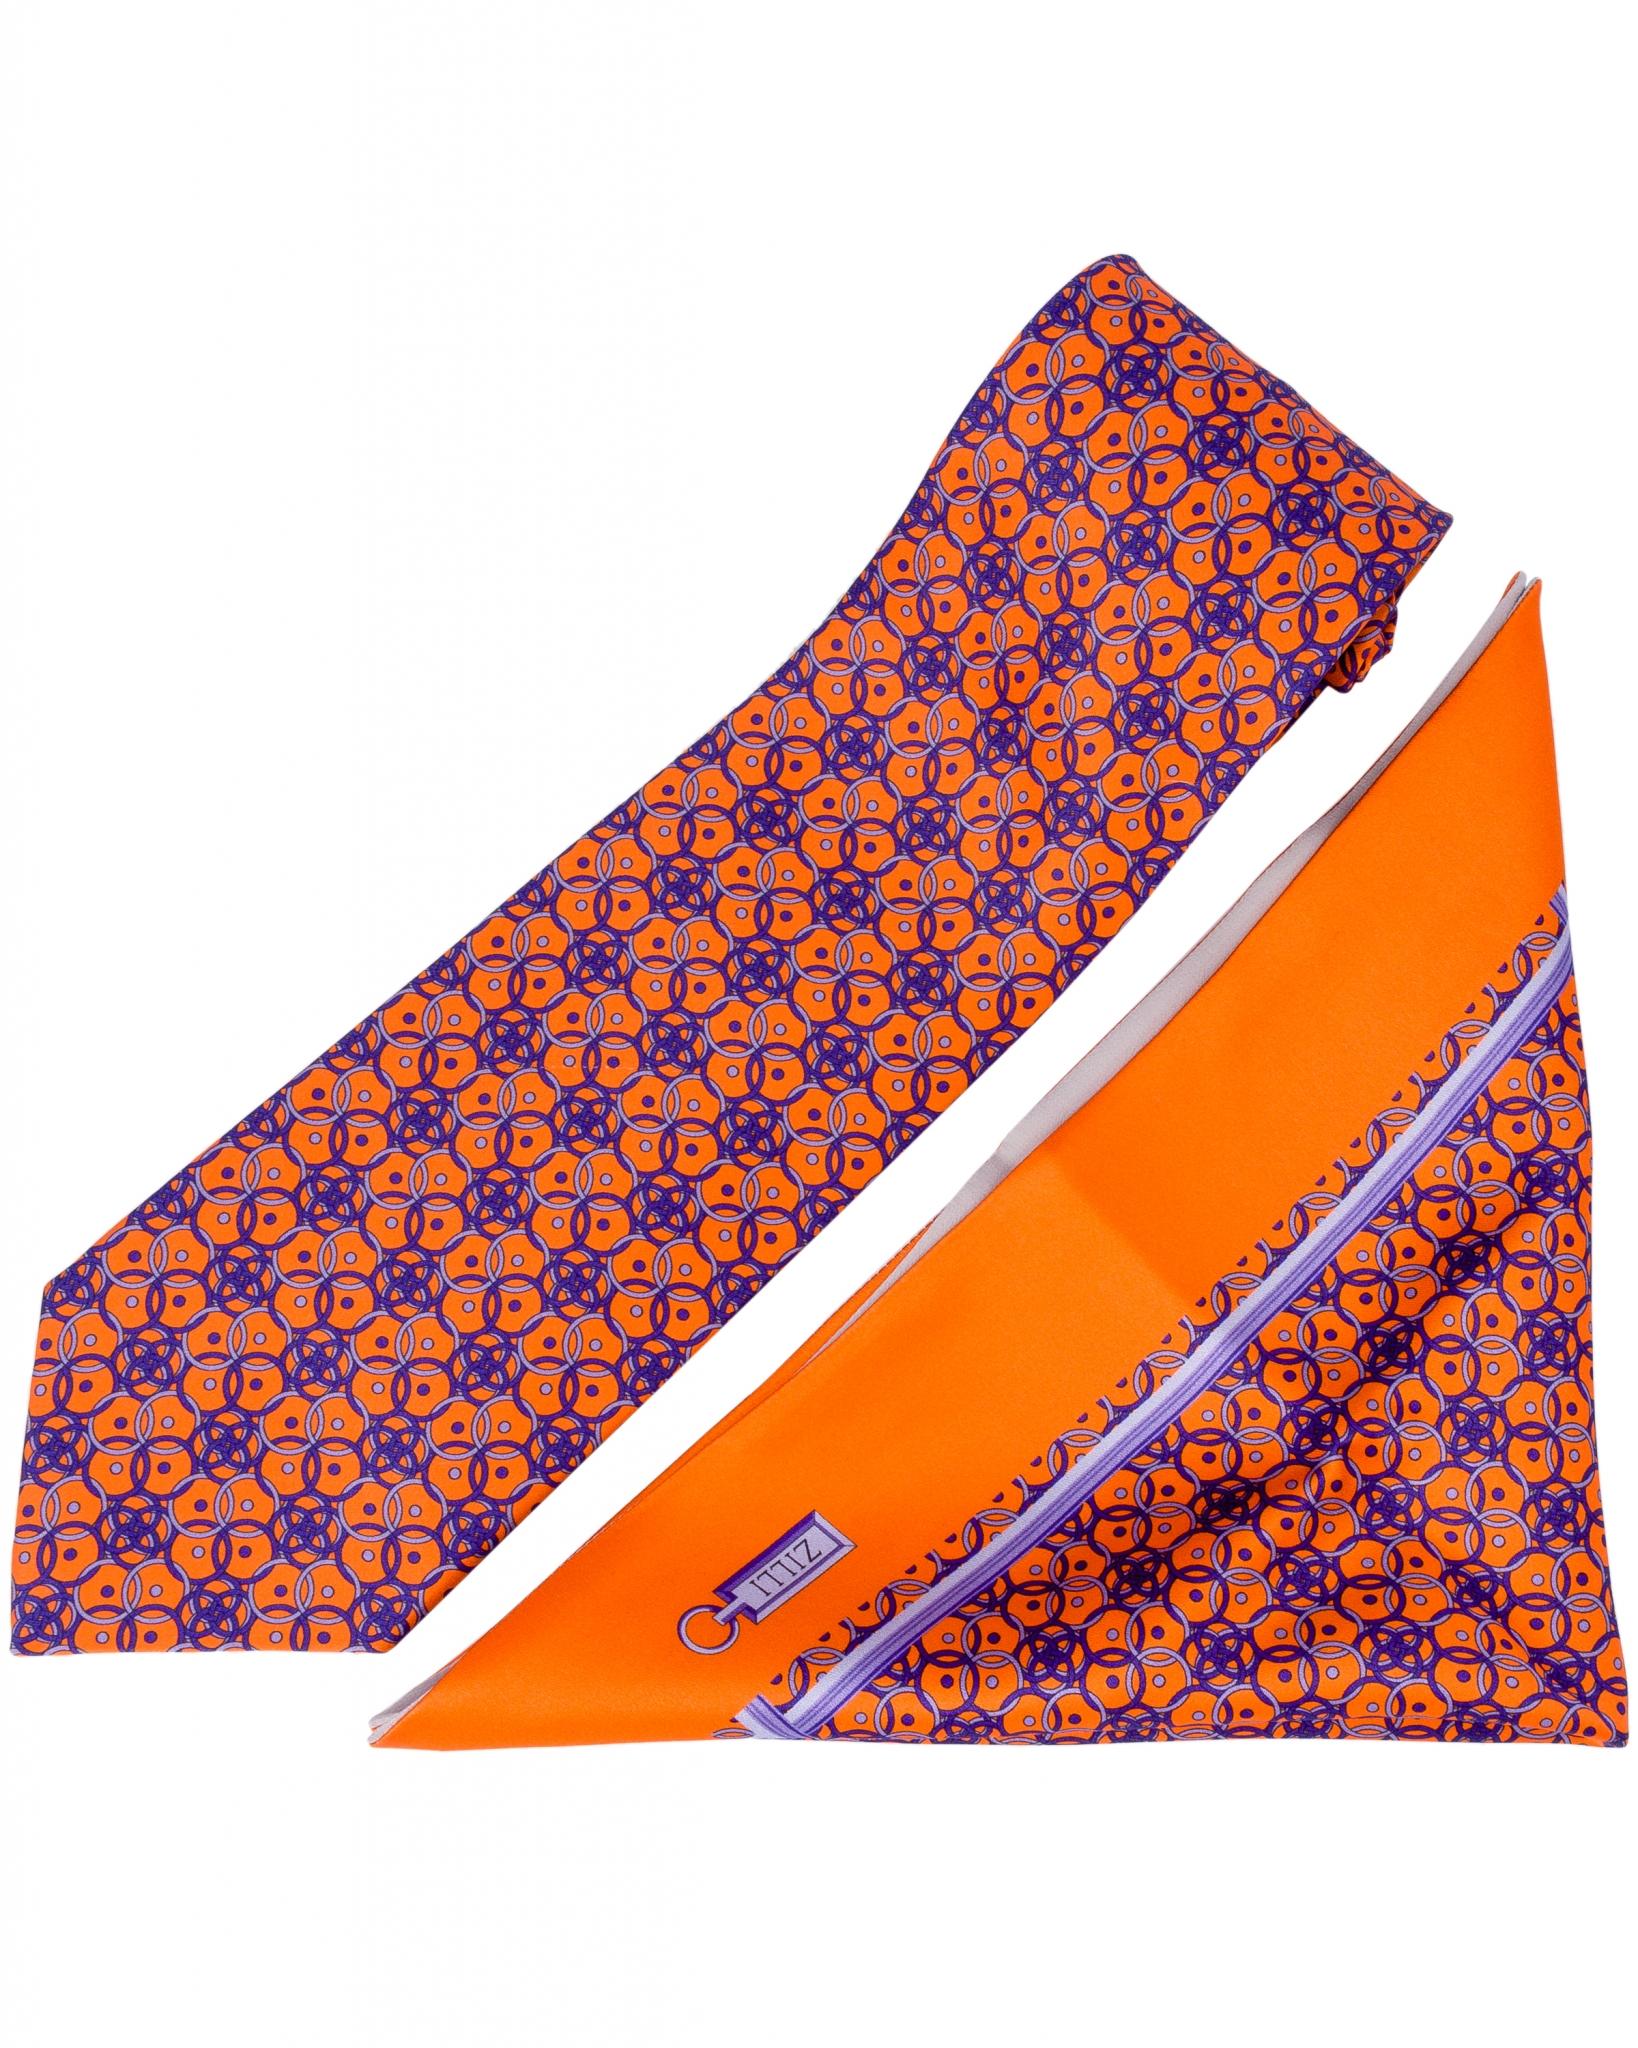 ZILLI – 100% Silk Tie & Pocket Square Set Orange|Blue 5732V04